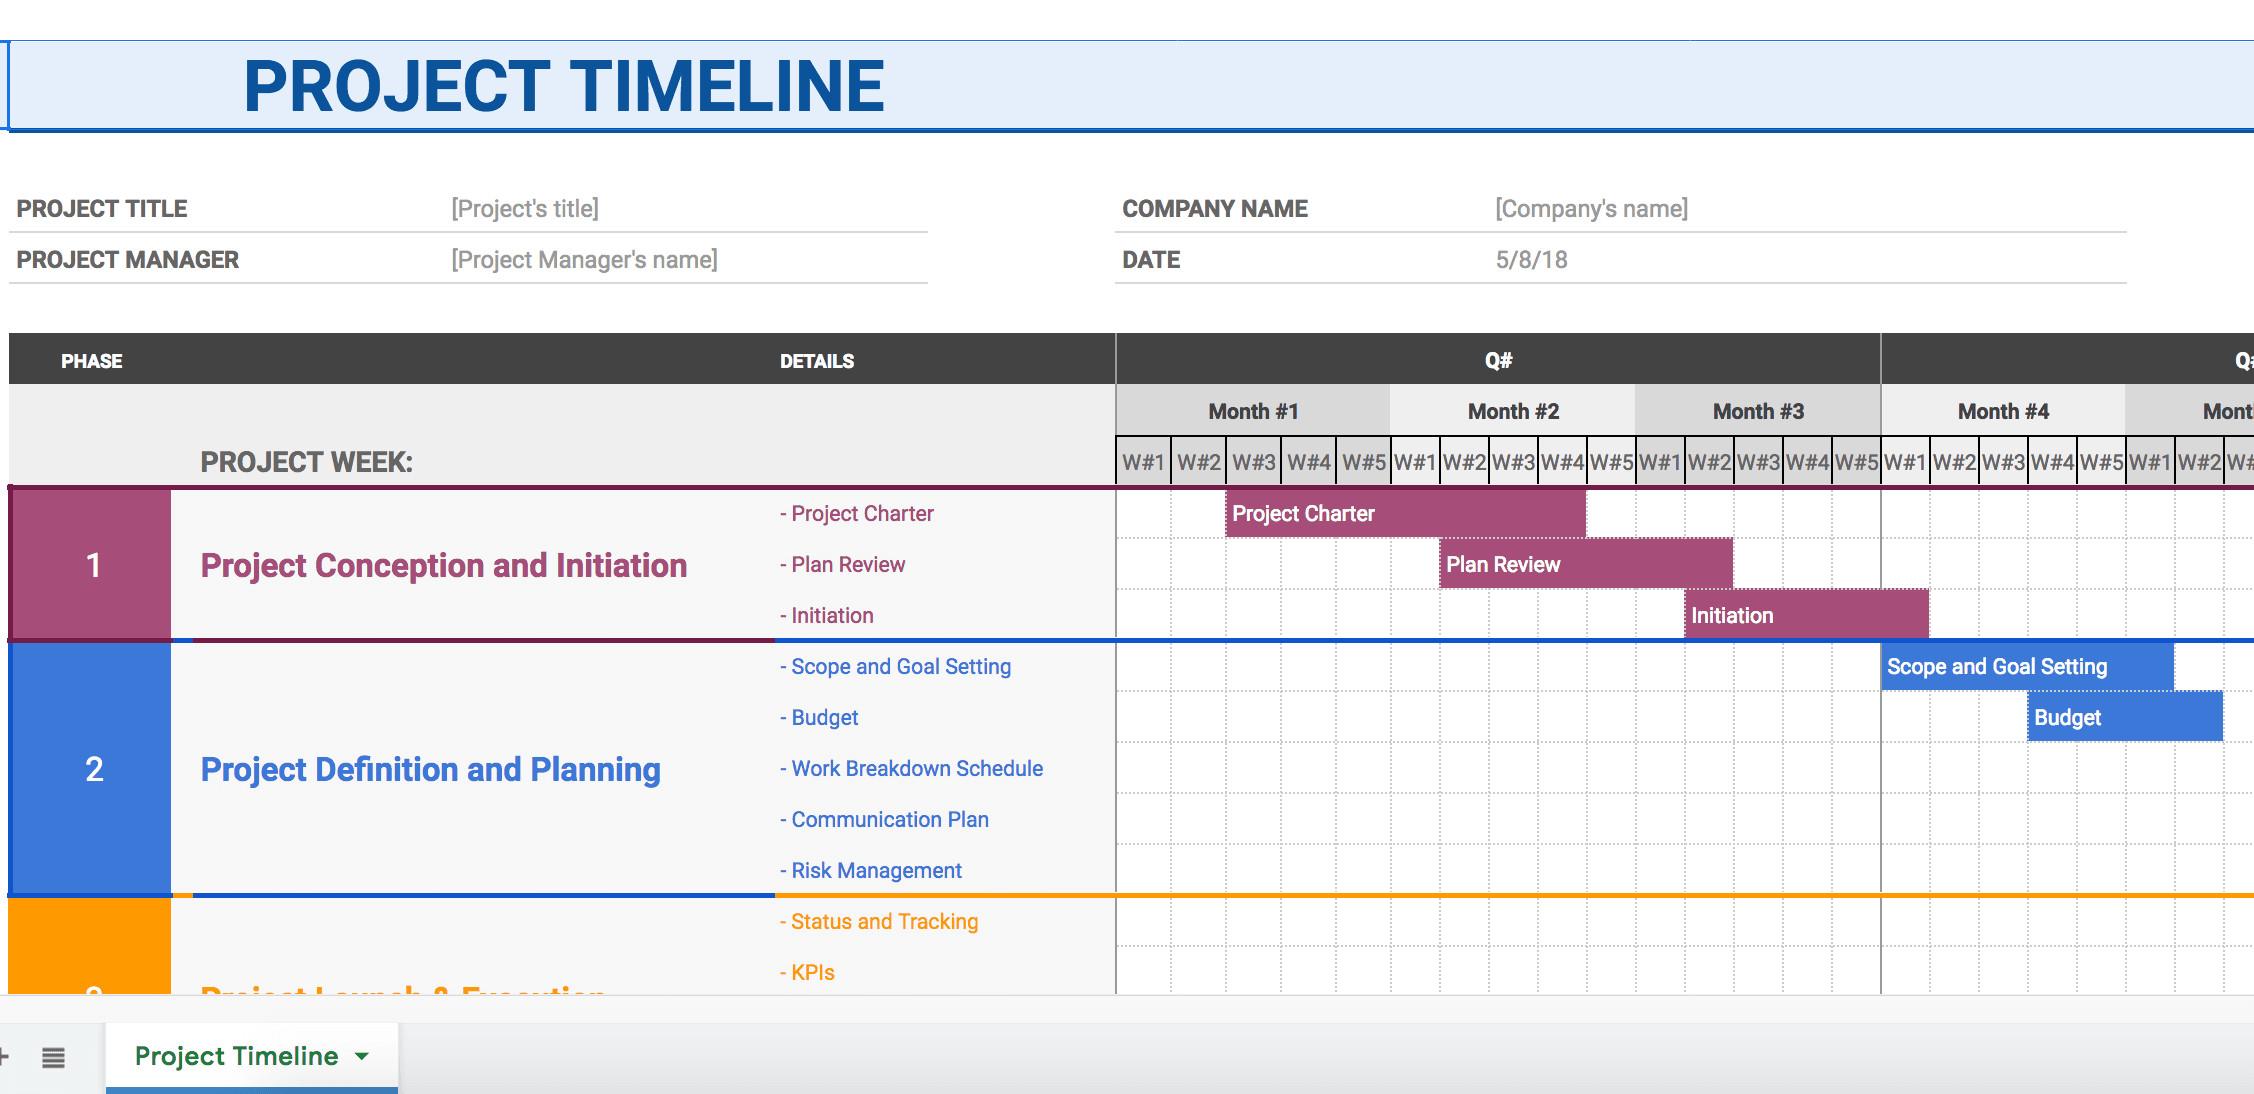 Timeline Template Google Docs How to Make A Timeline In Google Docs How to now